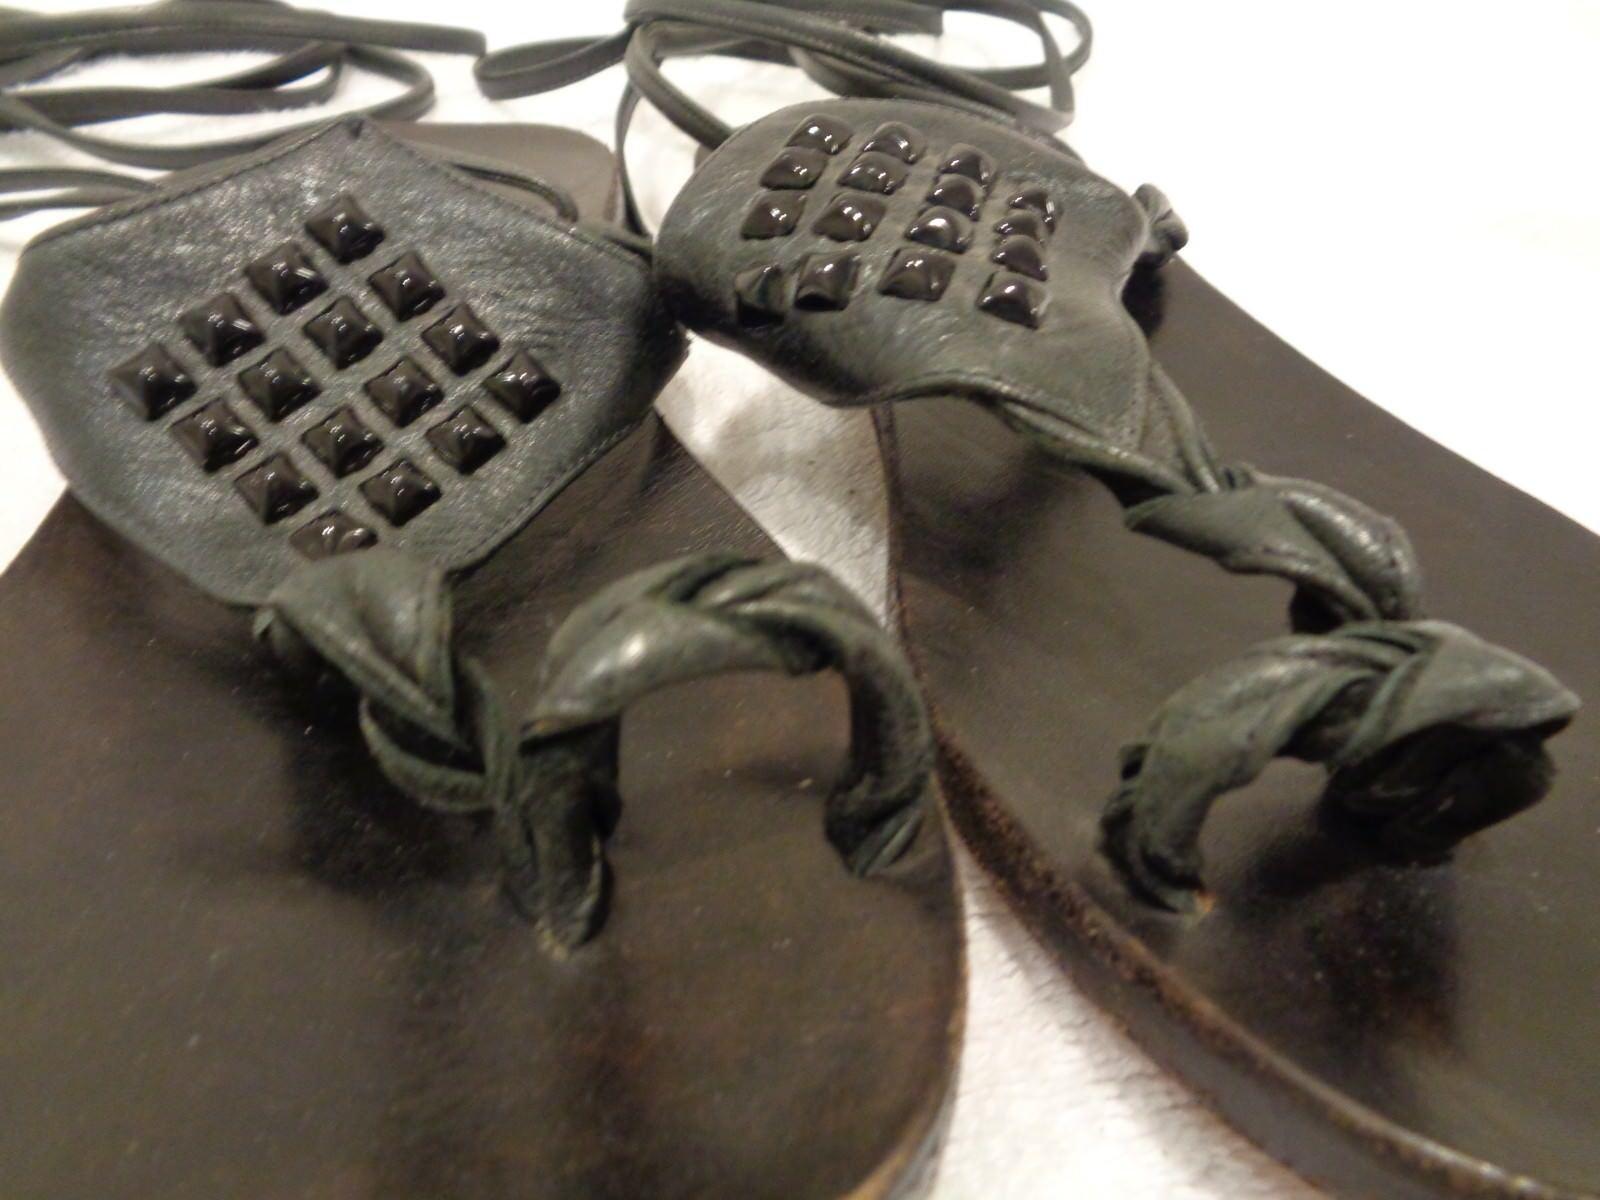 Kettle Black Black Black Ankle Strap studded Tie Toe Ring Slingback Sandals Flats SZ 7 d62d2d